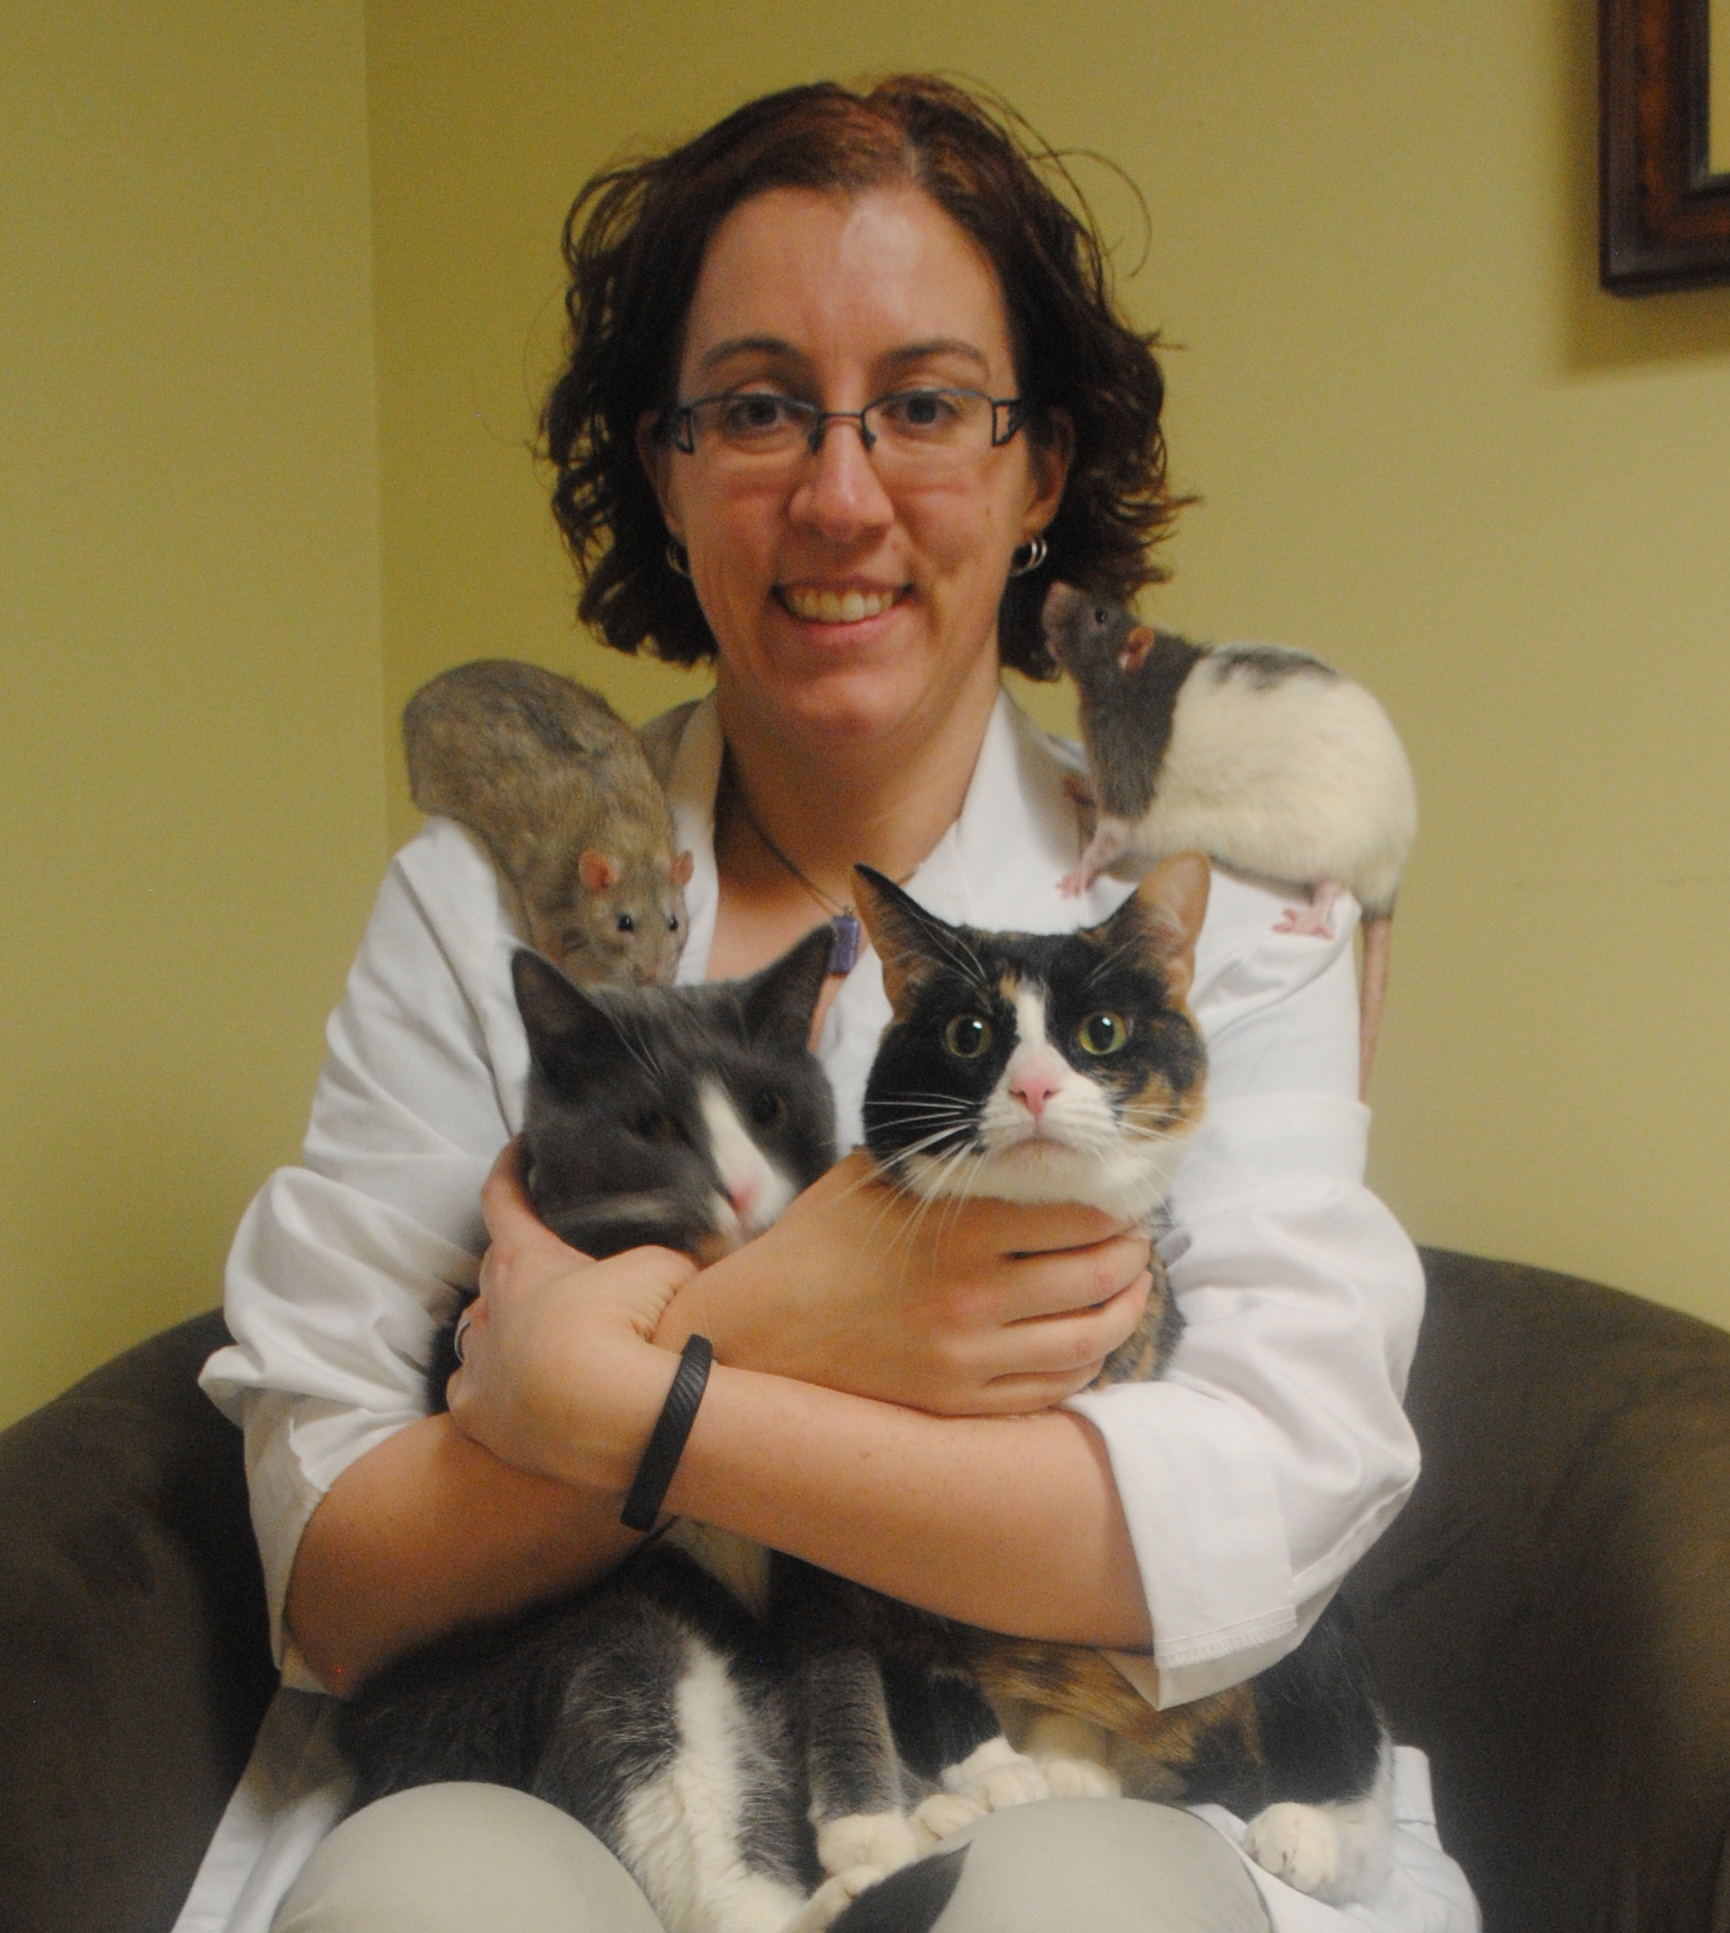 Kensington Bird and Animal Hospital, Veterinarians and Staff